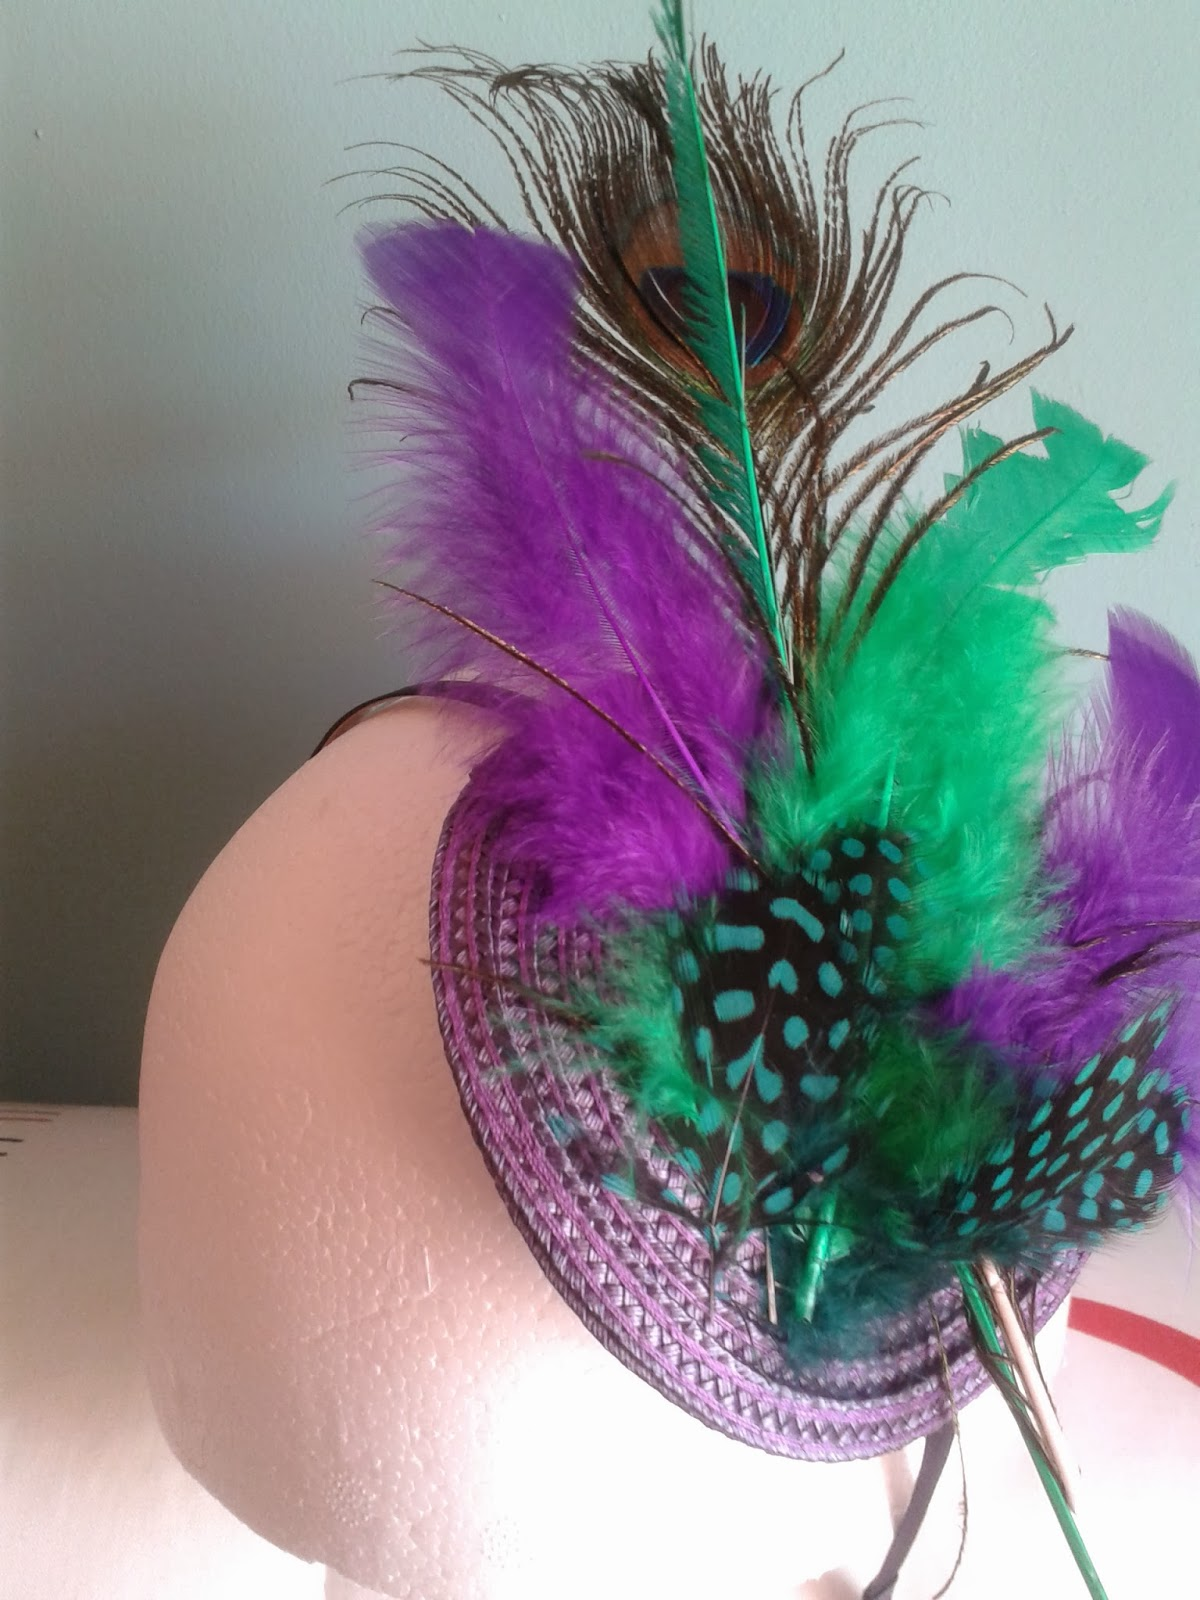 tocado barato, tocado económico, tocado para bodas, tocados online, tocado morado, tocado verde, plumas verdes, plumas moradas